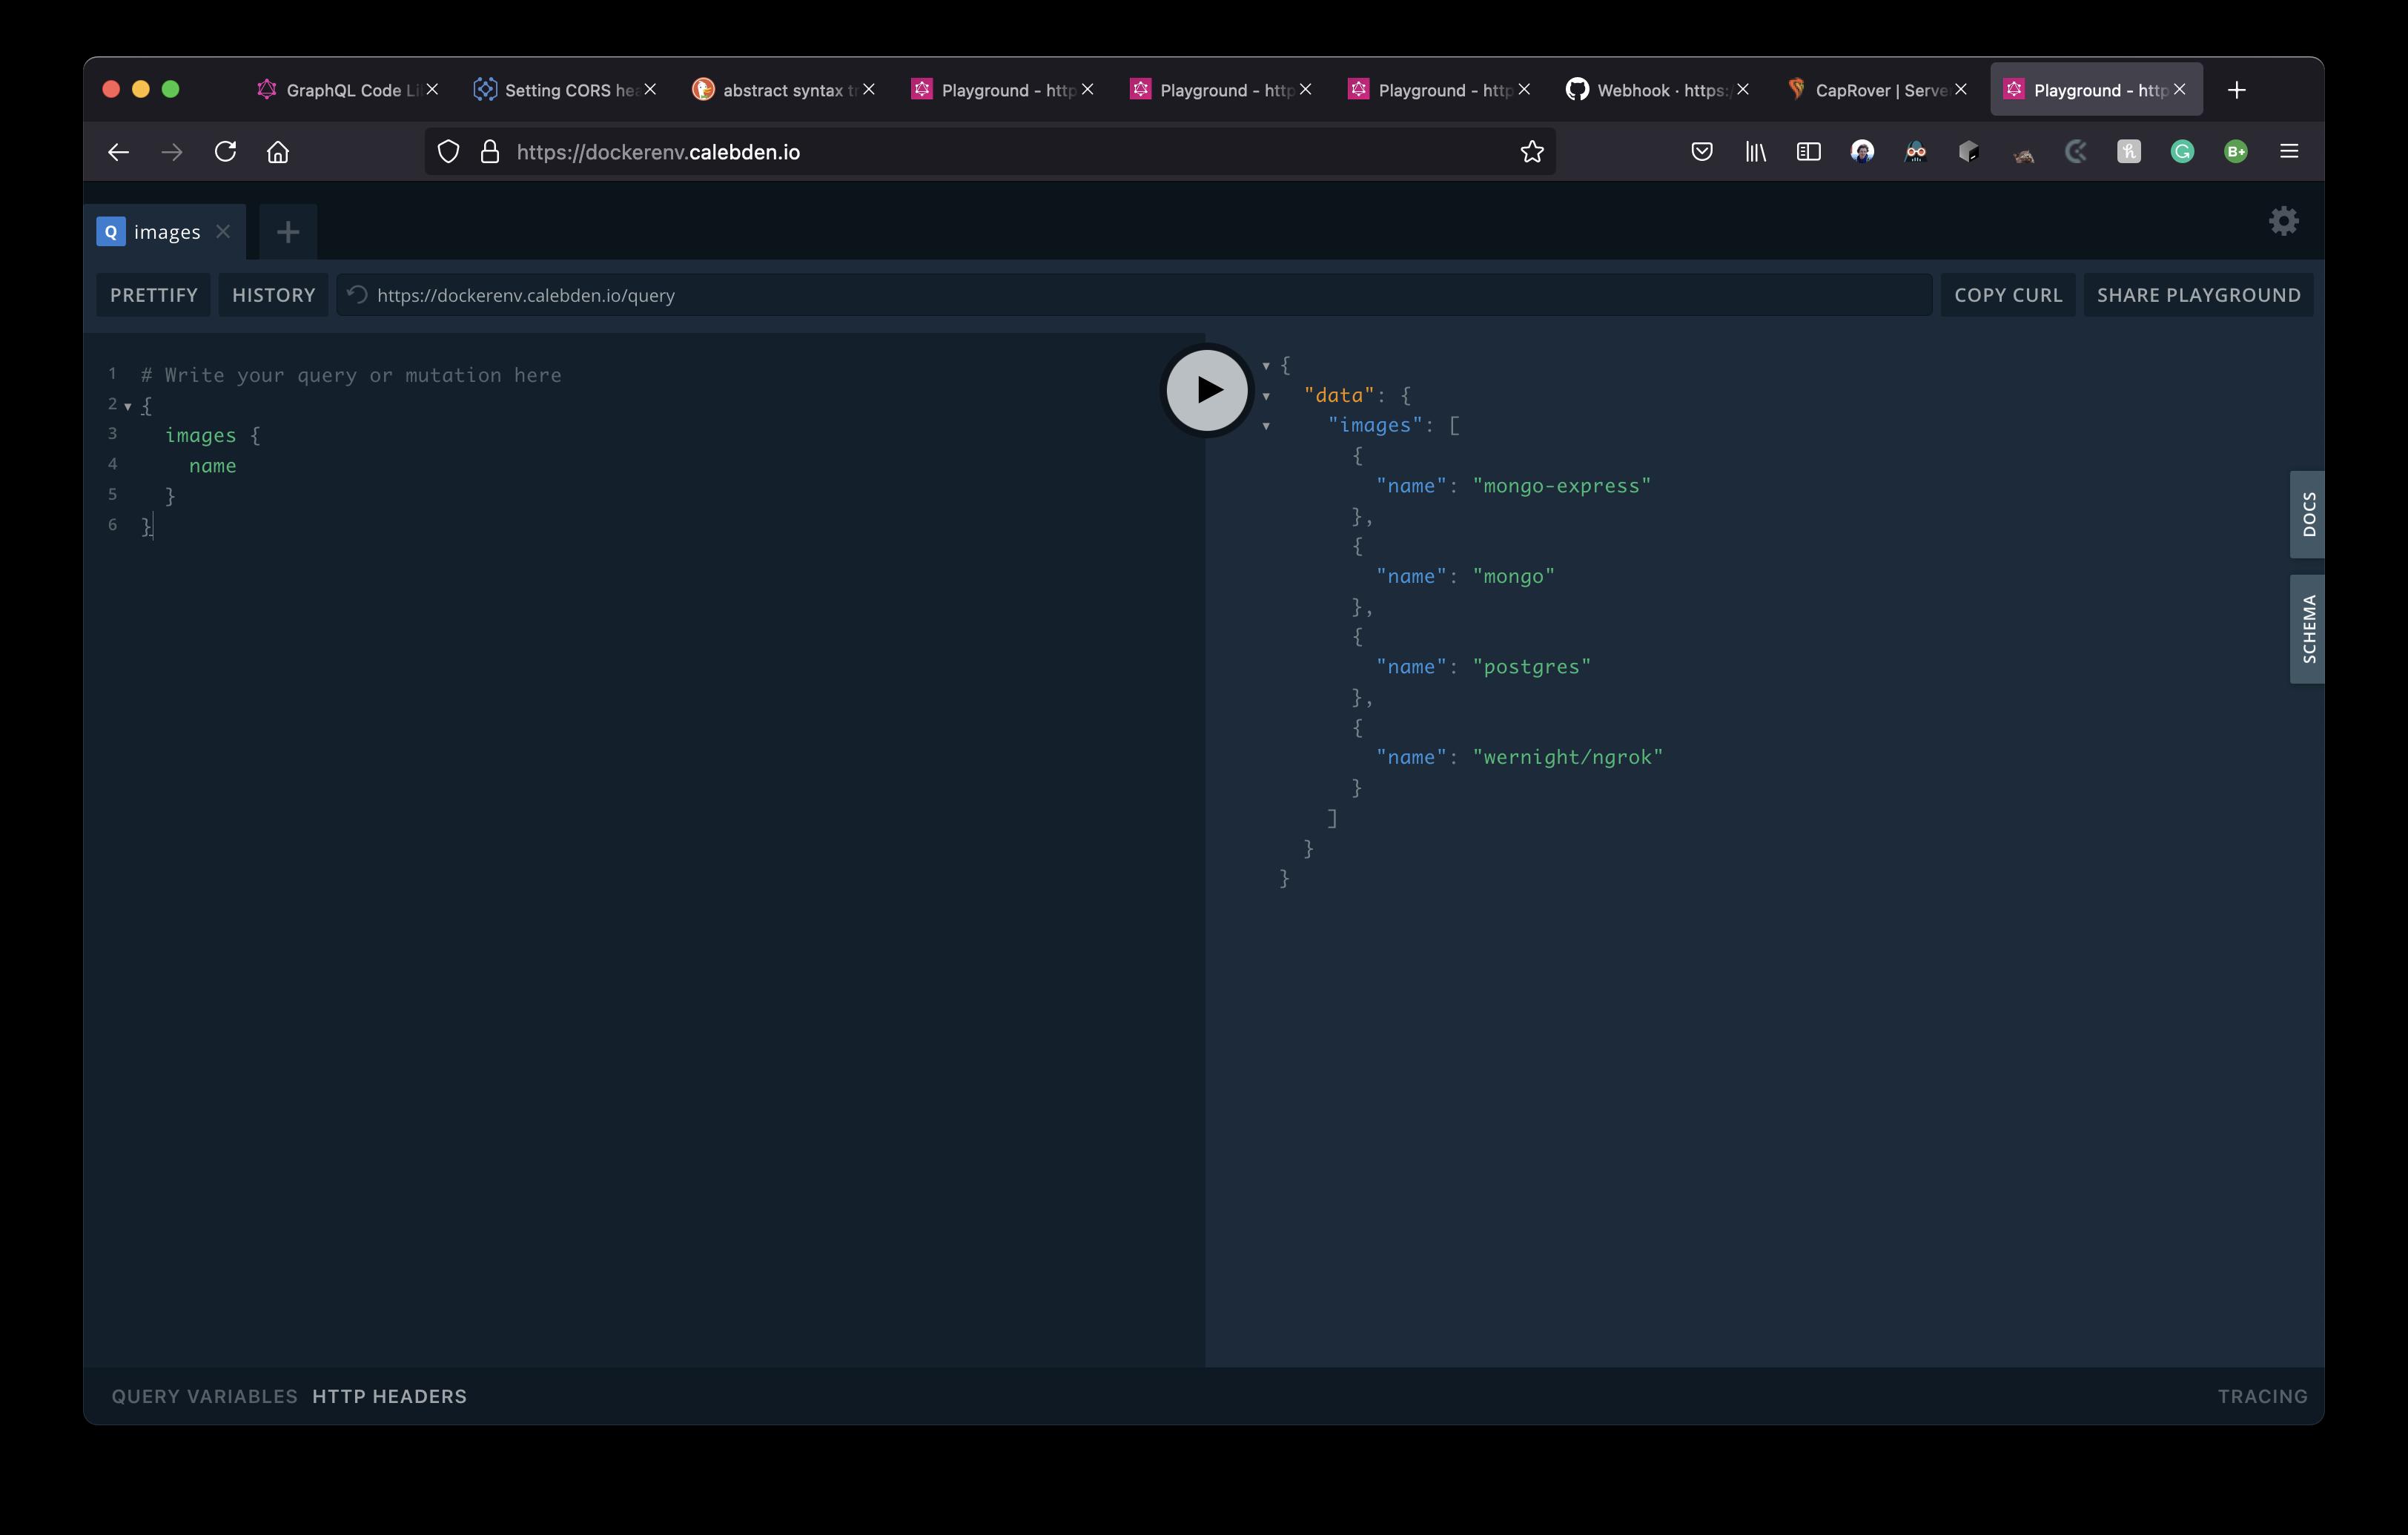 https://cloud-1yn7oa08i-hack-club-bot.vercel.app/0screen_shot_2021-06-16_at_9.59.19_pm.png